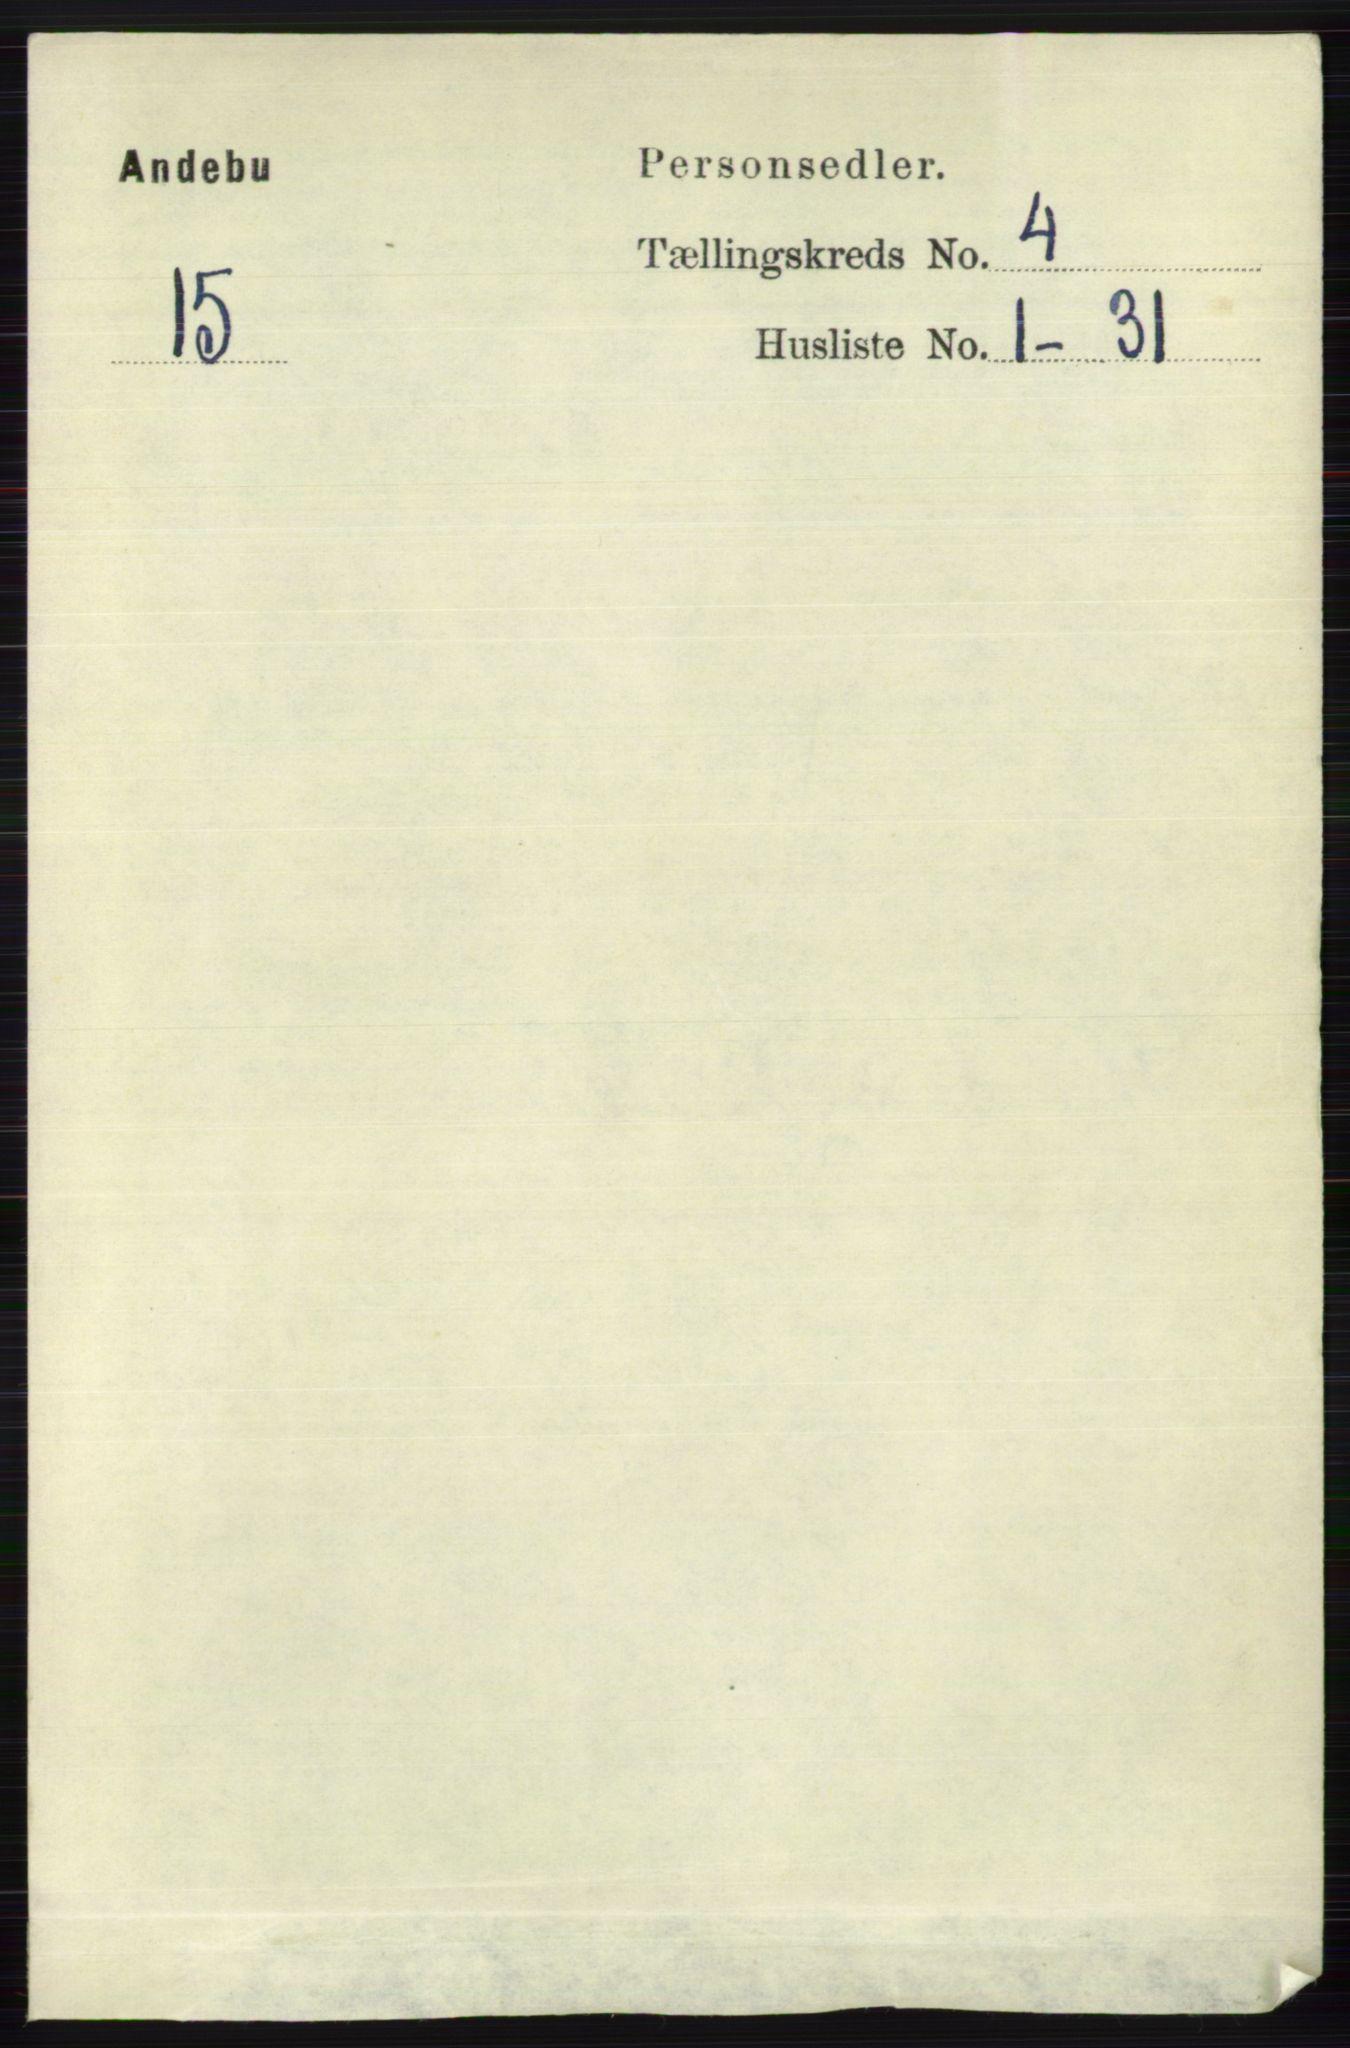 RA, Folketelling 1891 for 0719 Andebu herred, 1891, s. 2037